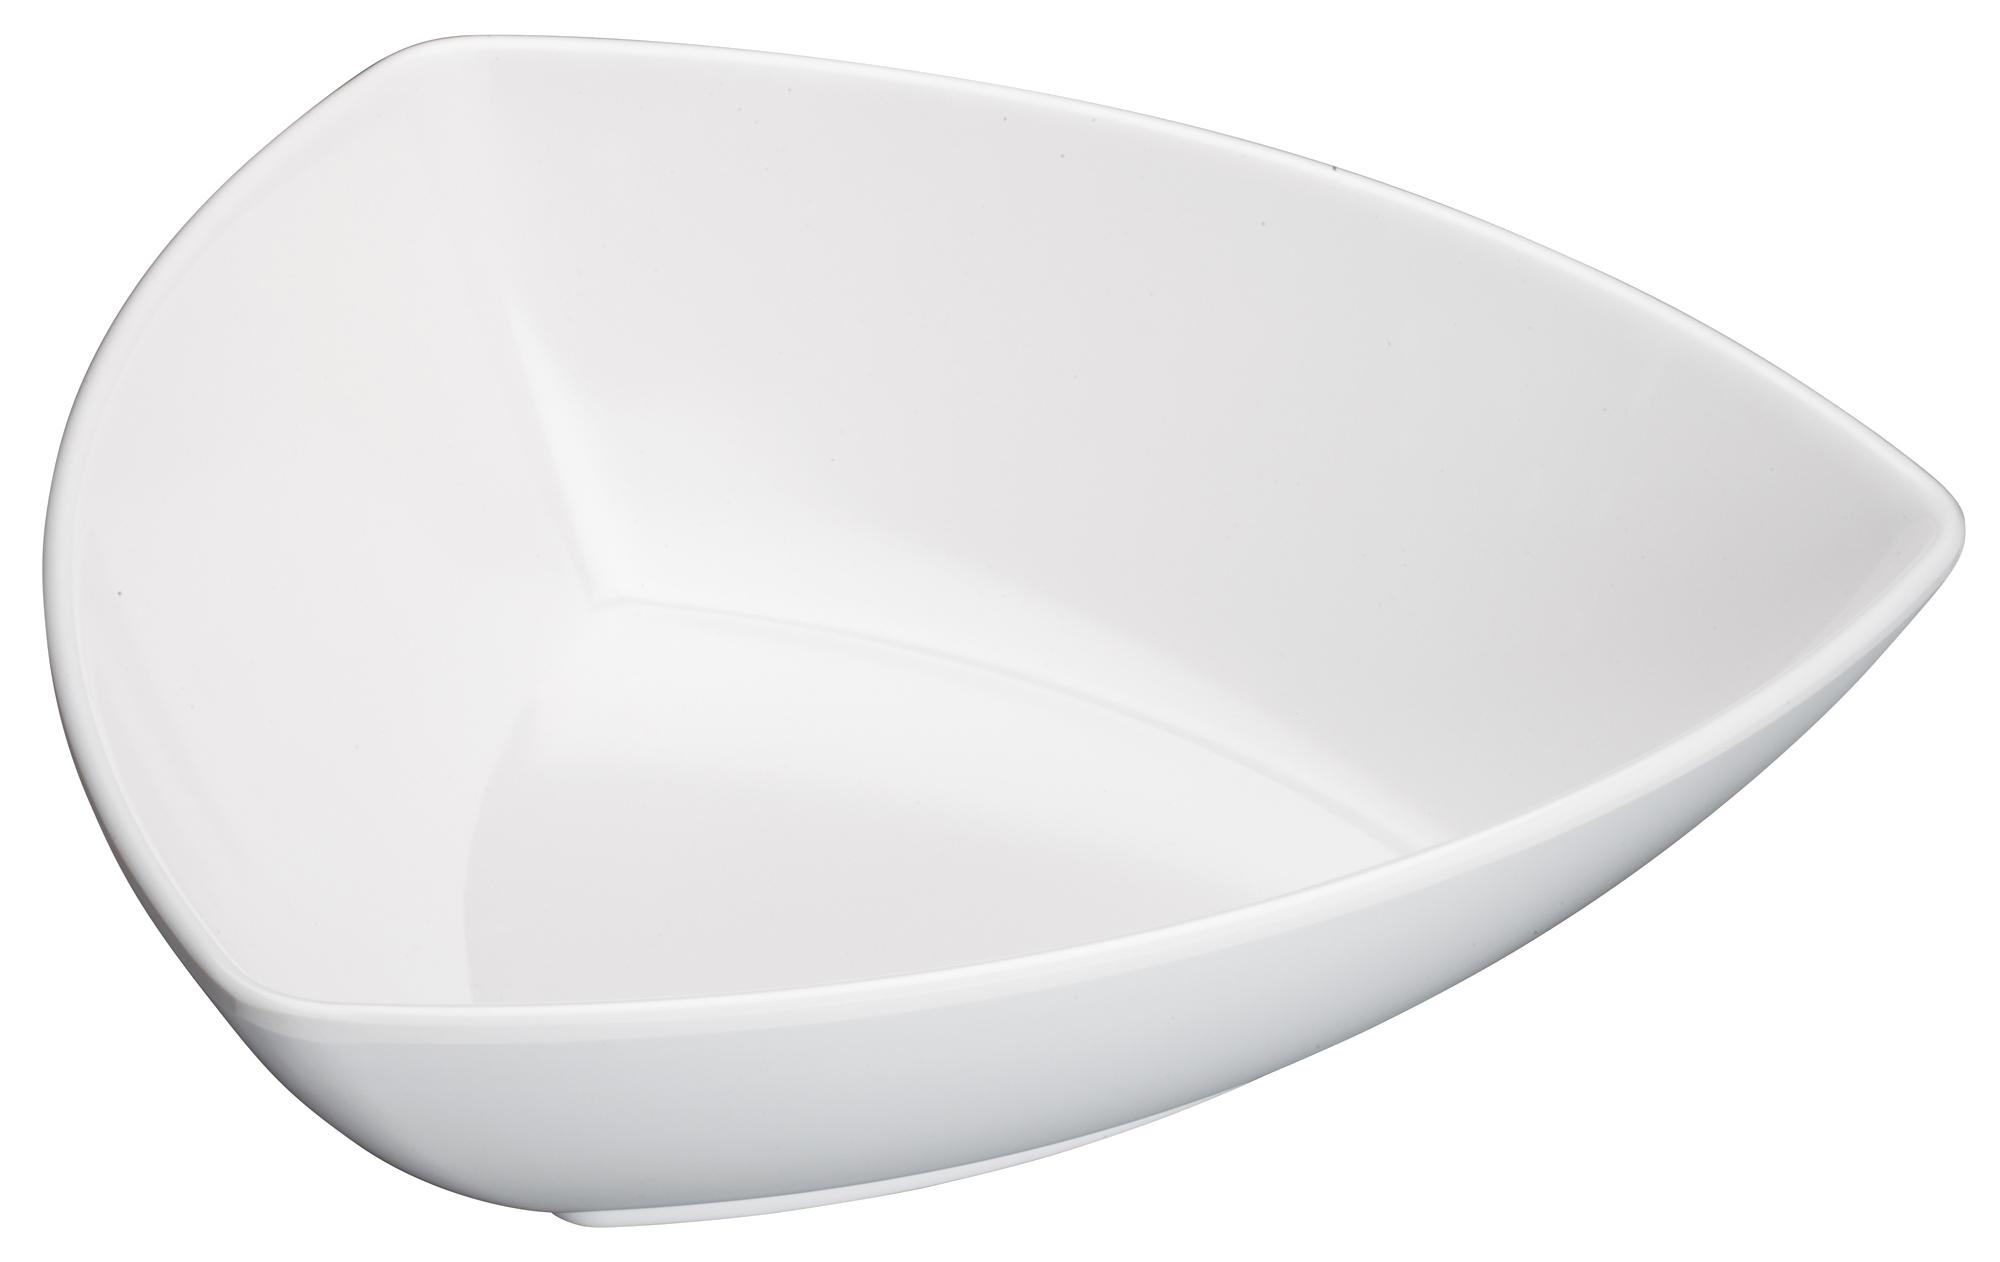 Winco WDM005-205 bowl, plastic,  1 - 2 qt (32 - 95 oz)